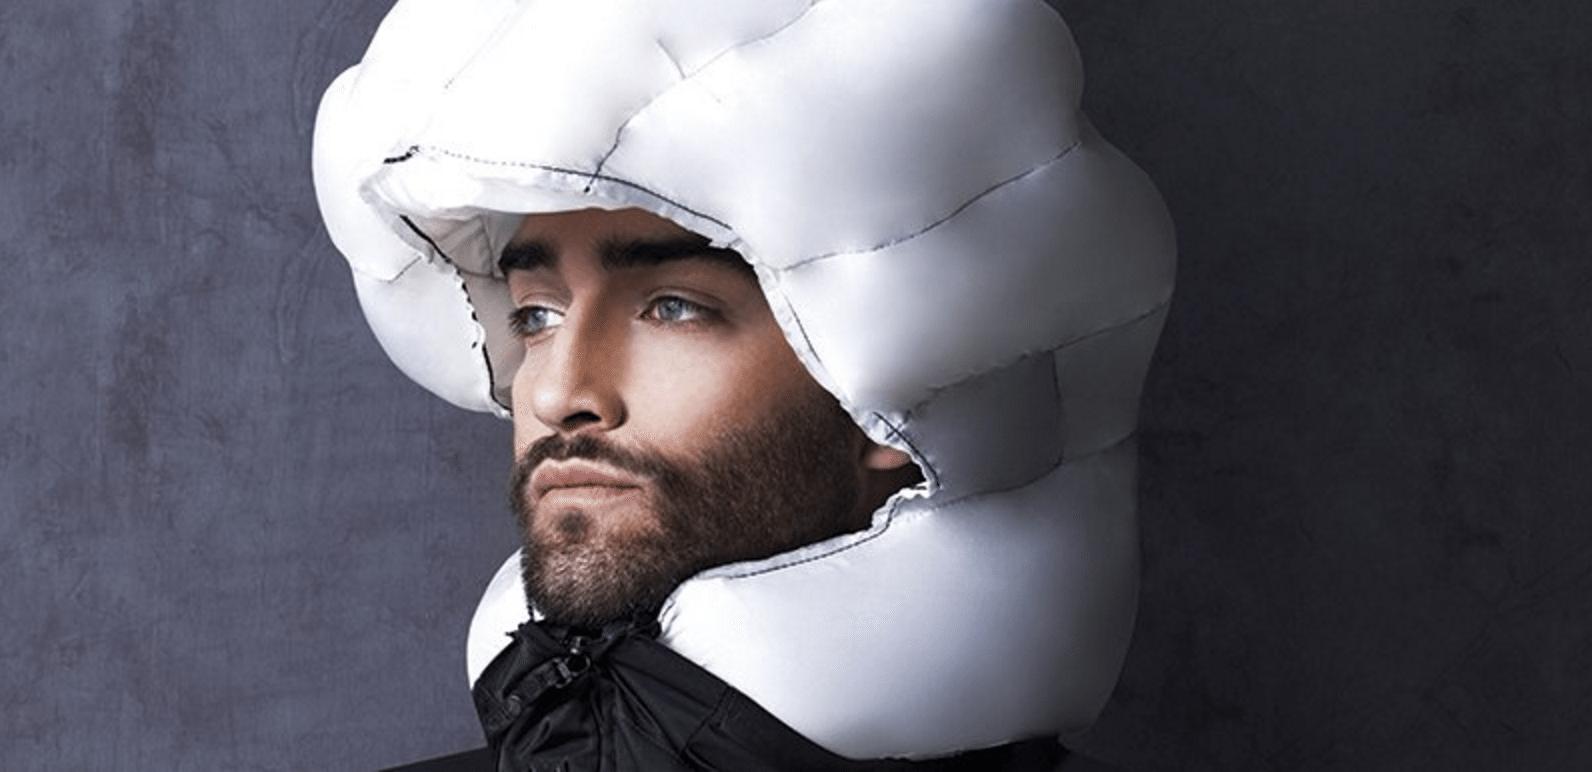 høvding hjelm